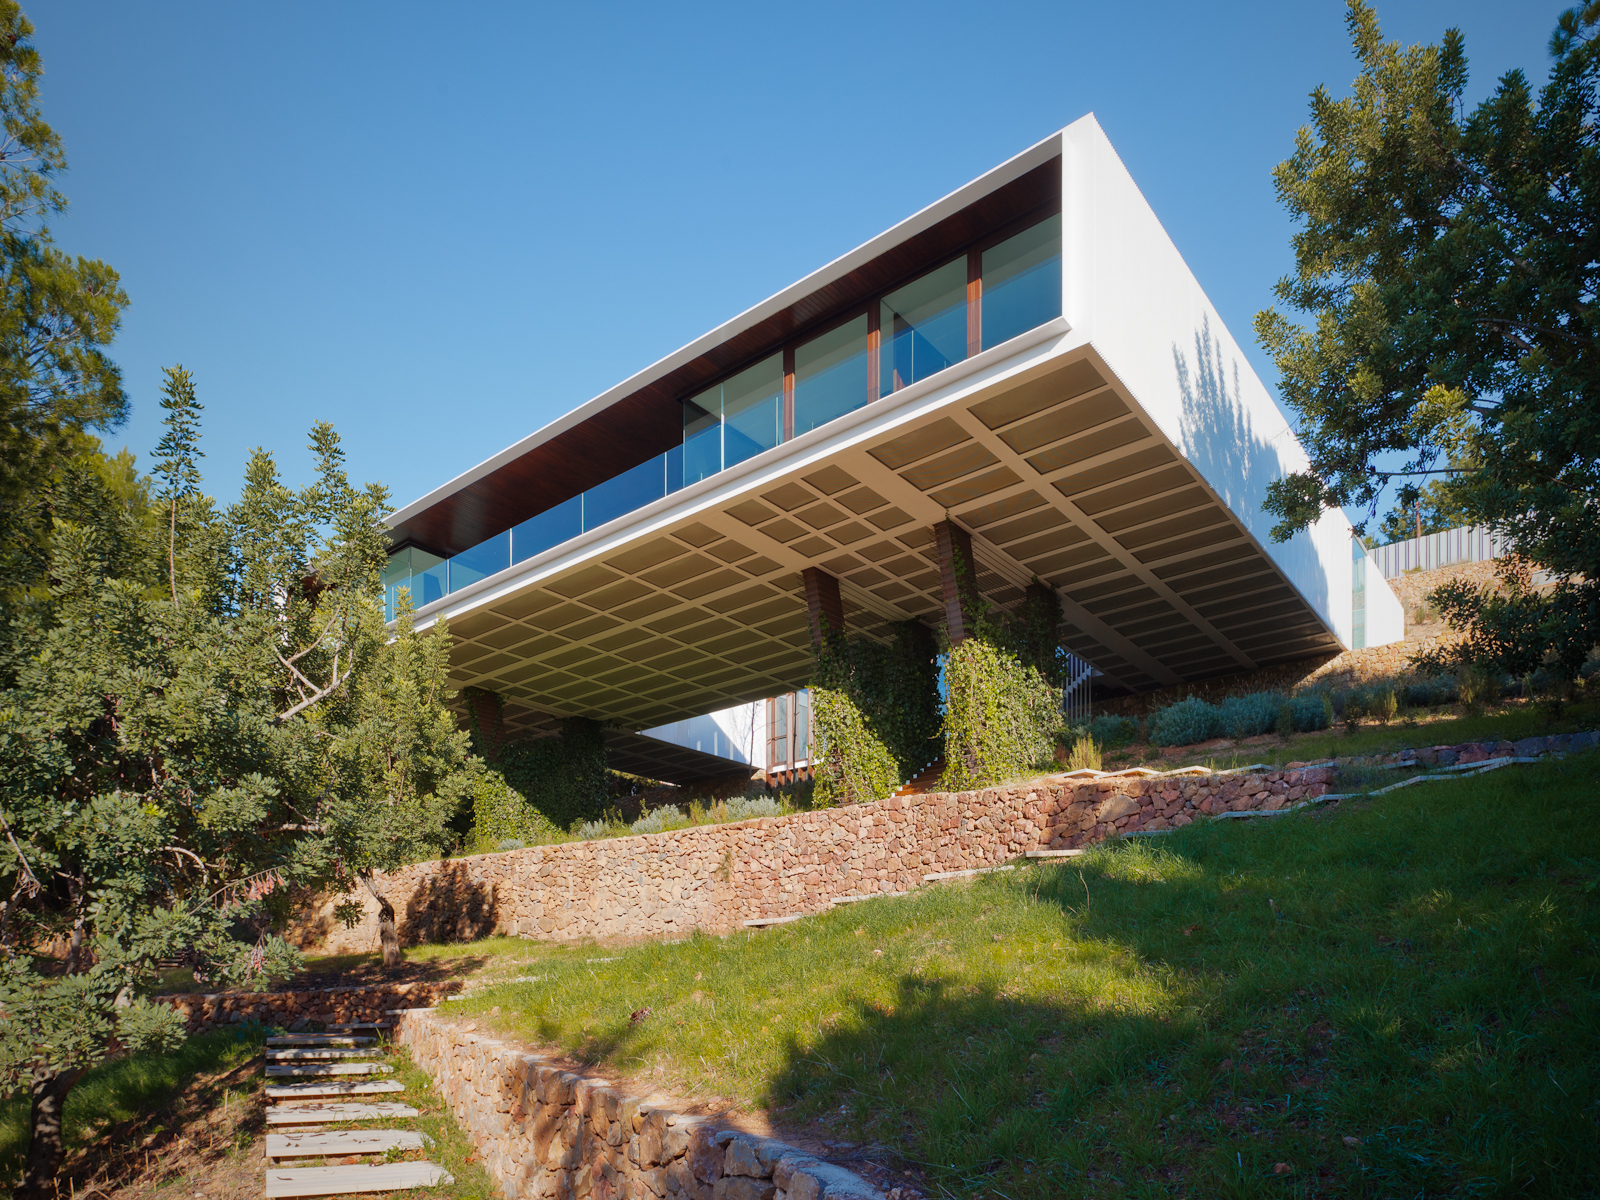 50467b6e28ba0d7ece0001d8 bf house oab adi jgc 111228 7808 9 - Best house castellon ...